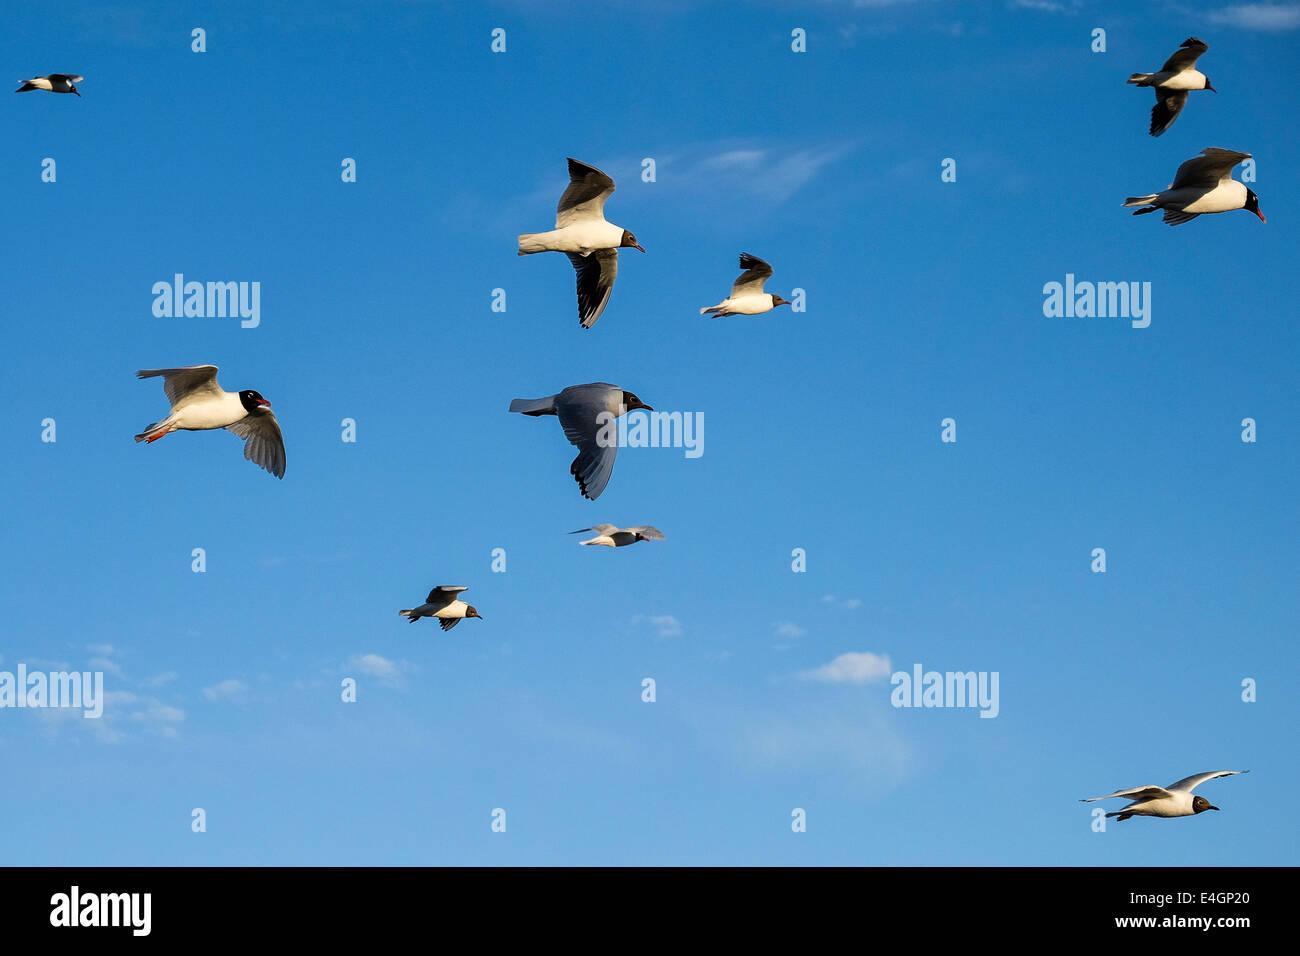 Black Headed Gulls. - Stock Image